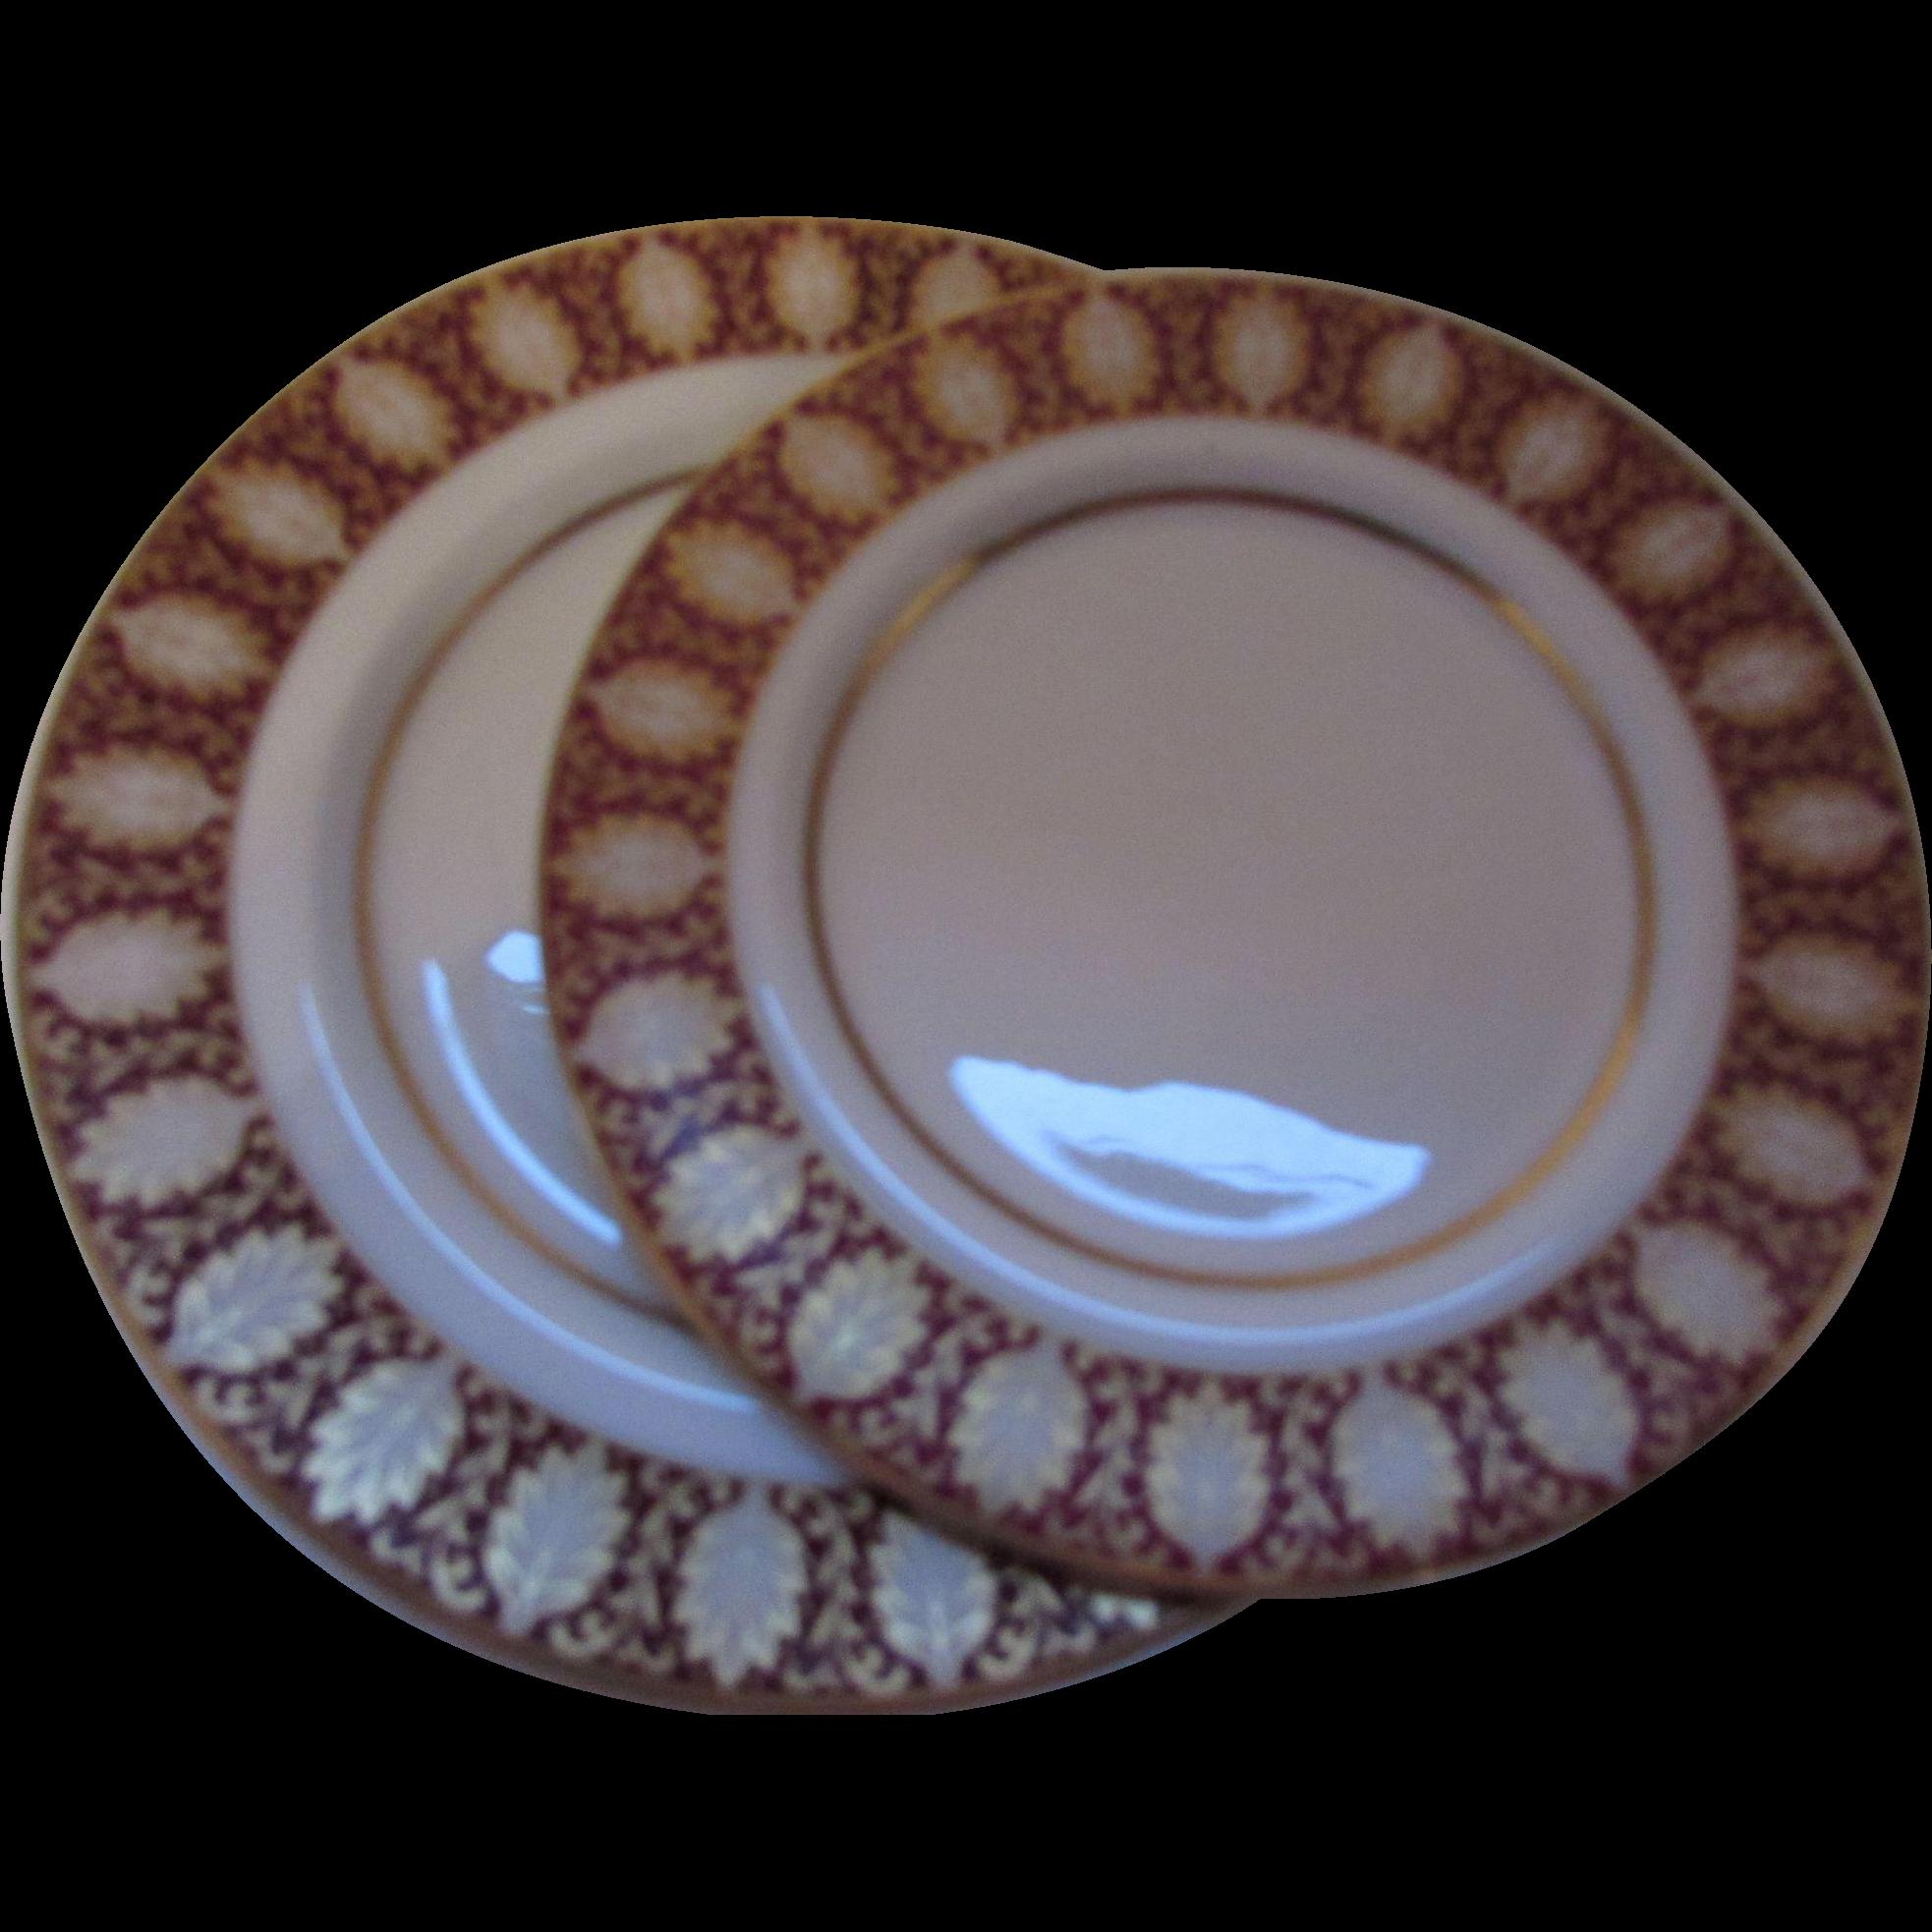 1974 Mikasa Westhampton Pattern 4 Piece Dinner Plate Set